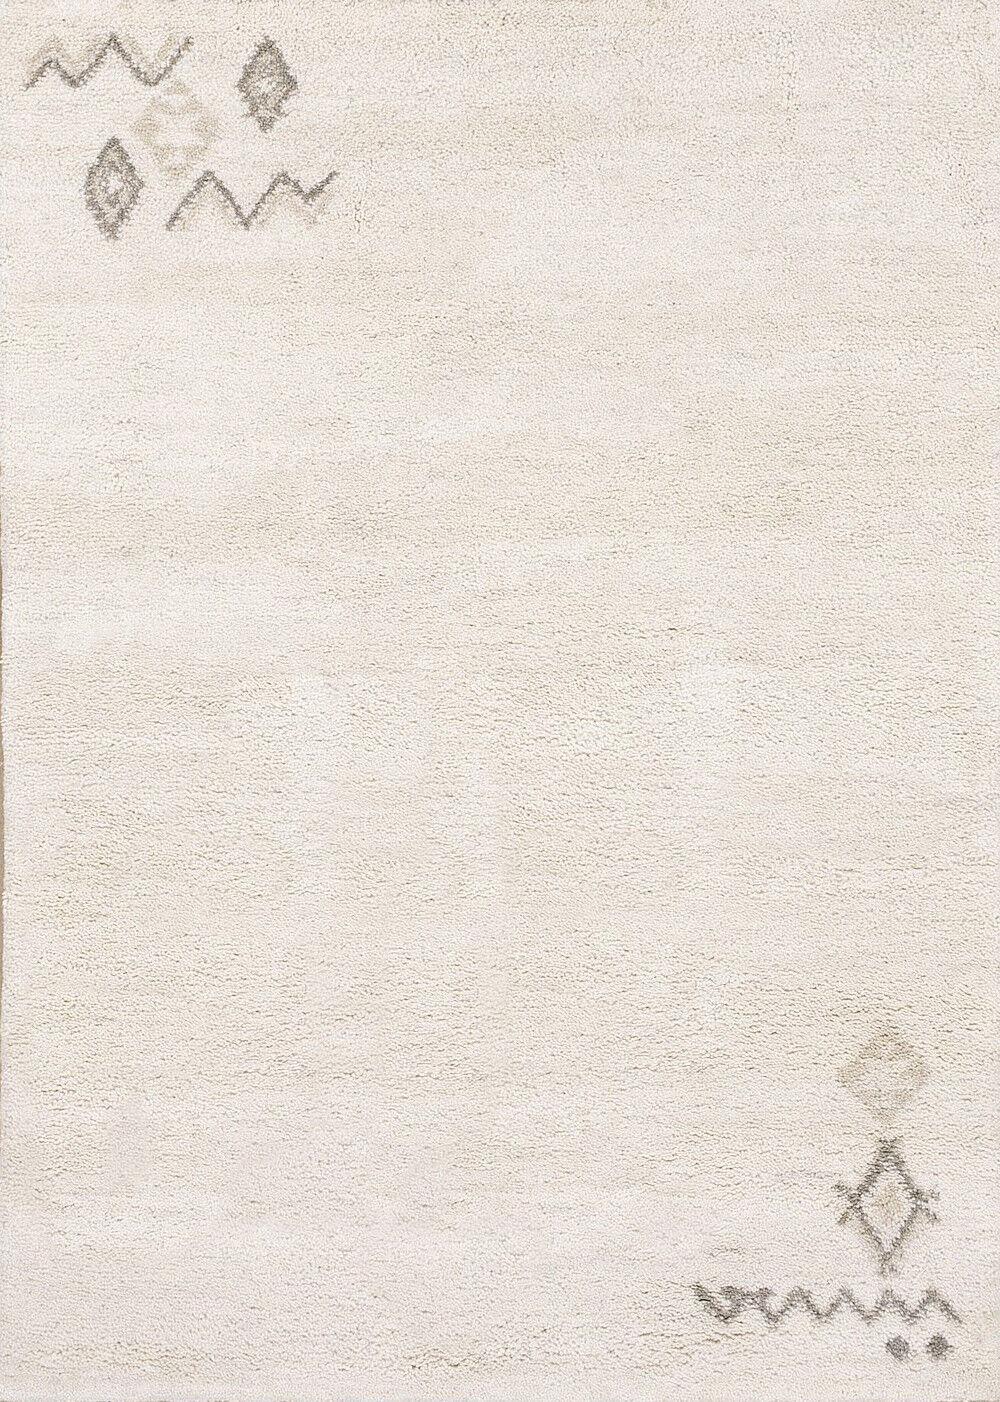 TAPPETO Berbero Rabat 140 x 200 cm con motivo 100% LANA VERGINE 15 15 Simple